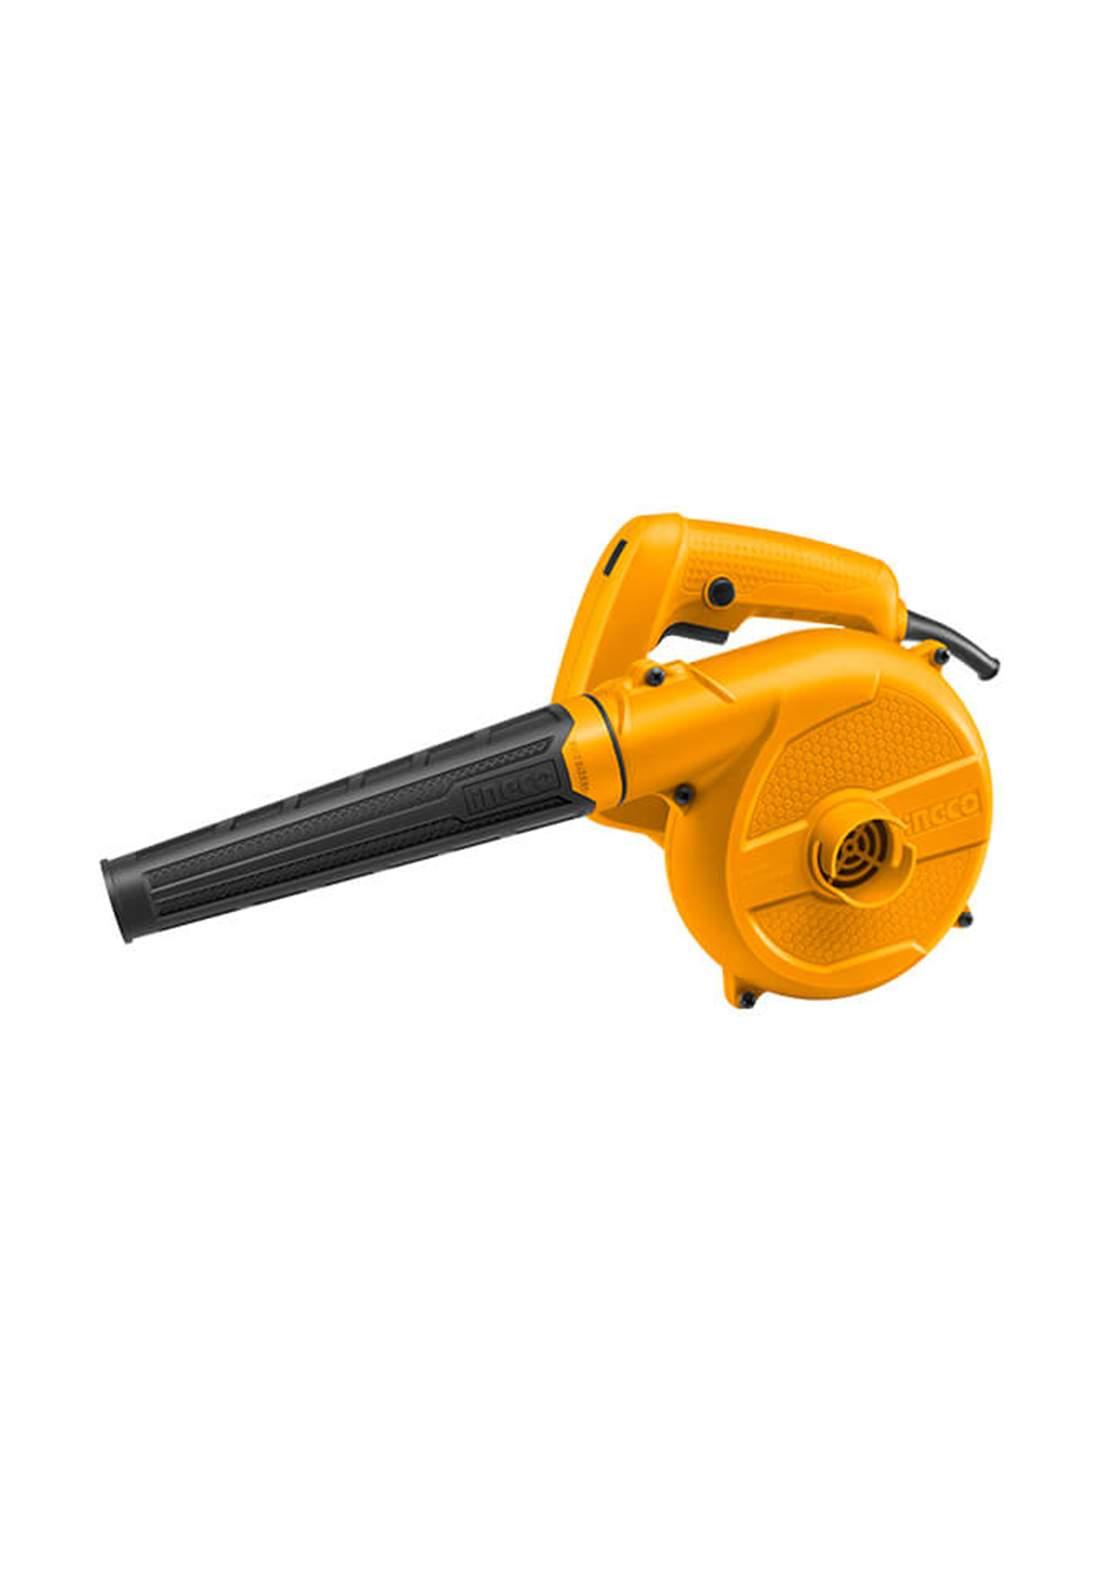 Ingco AB4018 Aspirator Blower 400 Watt بلاور هواء